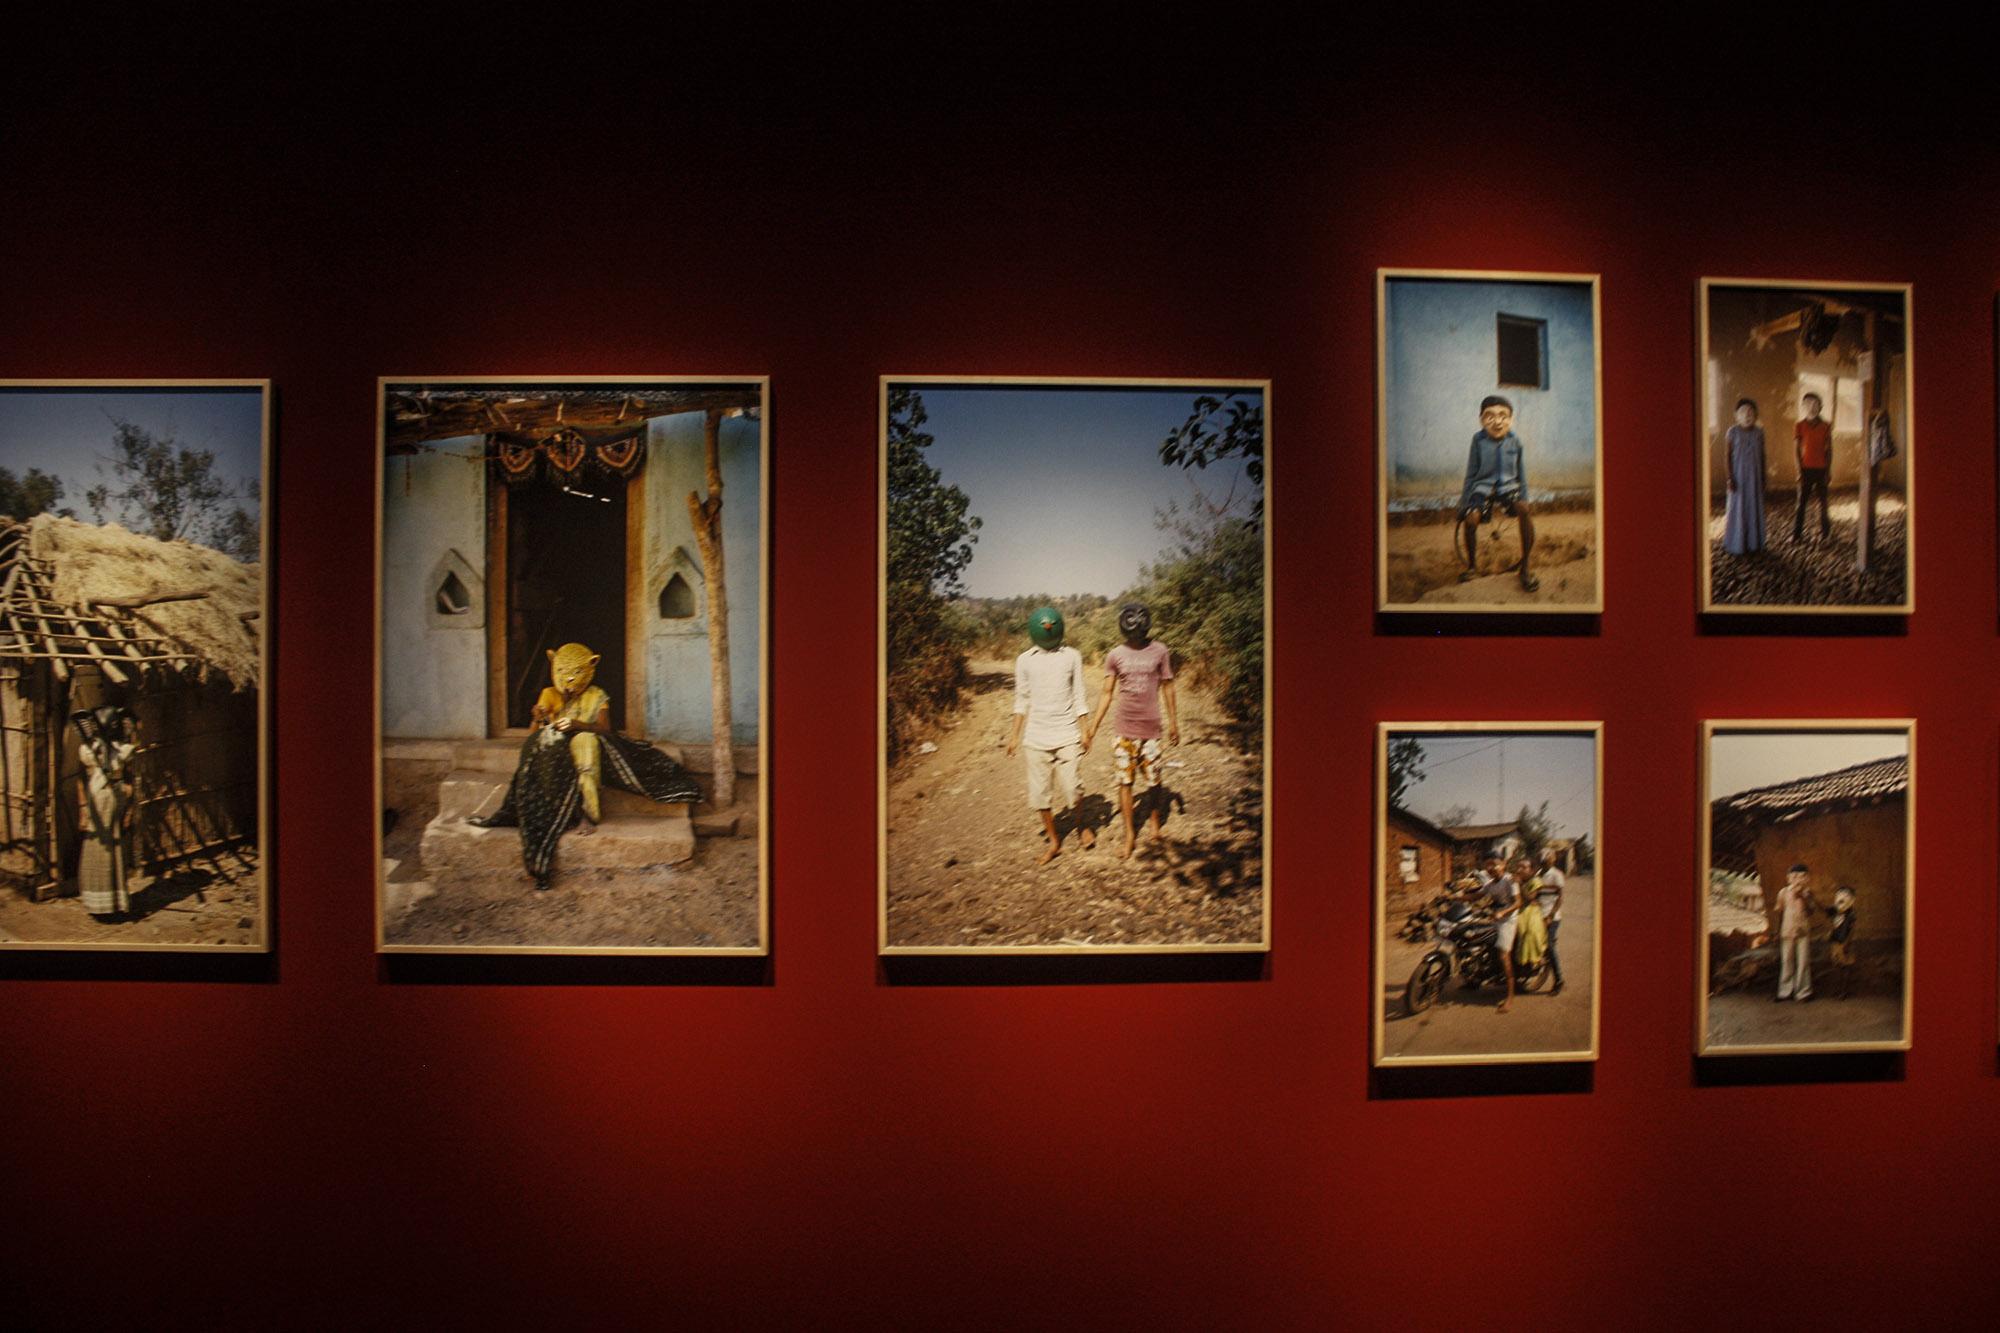 Gauri Gill and Rajesh Vangad, documenta14 (Kassel)